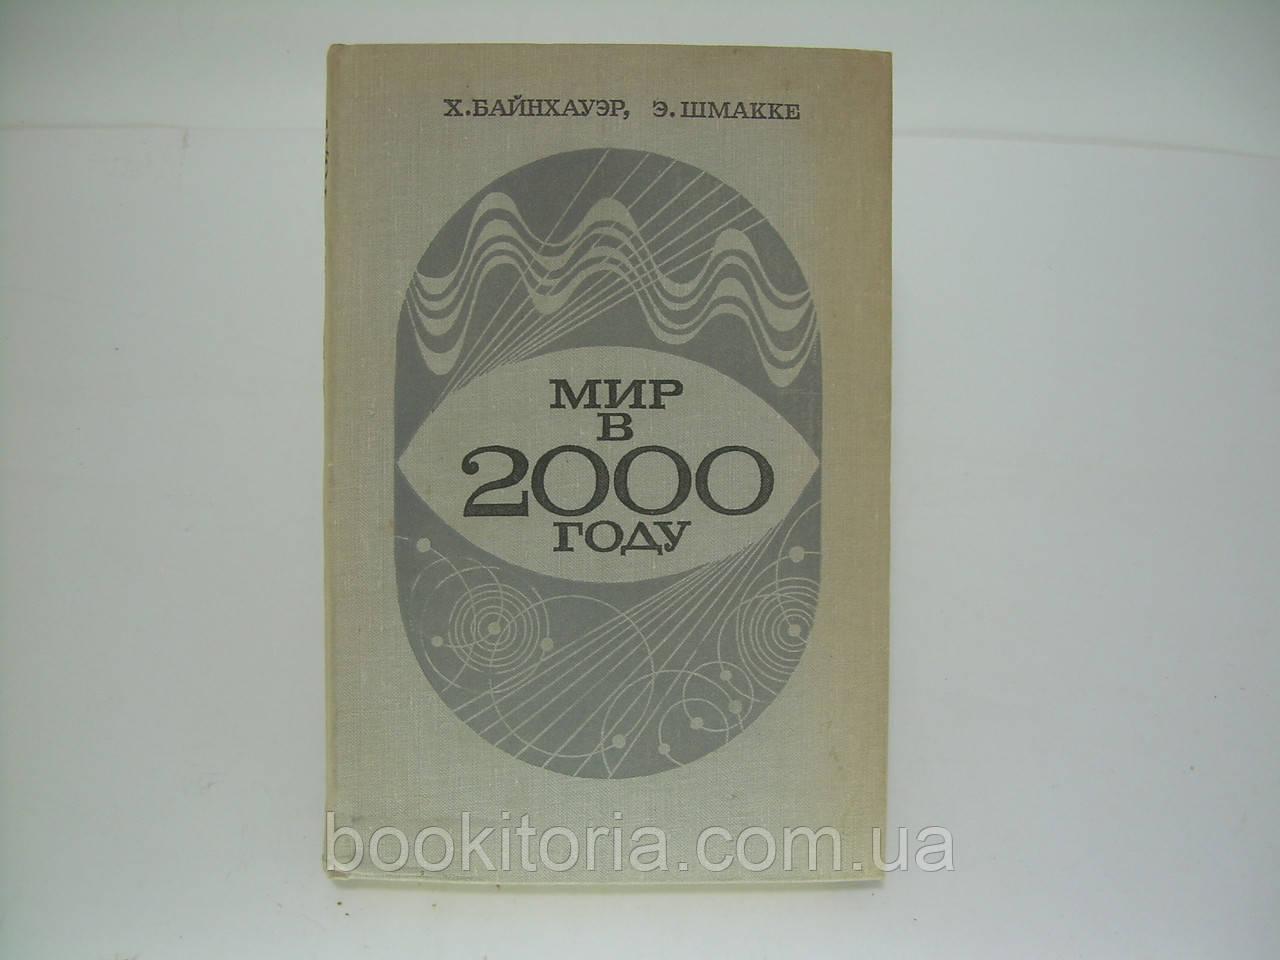 Байнхауэр Х., Шмакке Э. Мир в 2000 году. Свод международных прогнозов (б/у).